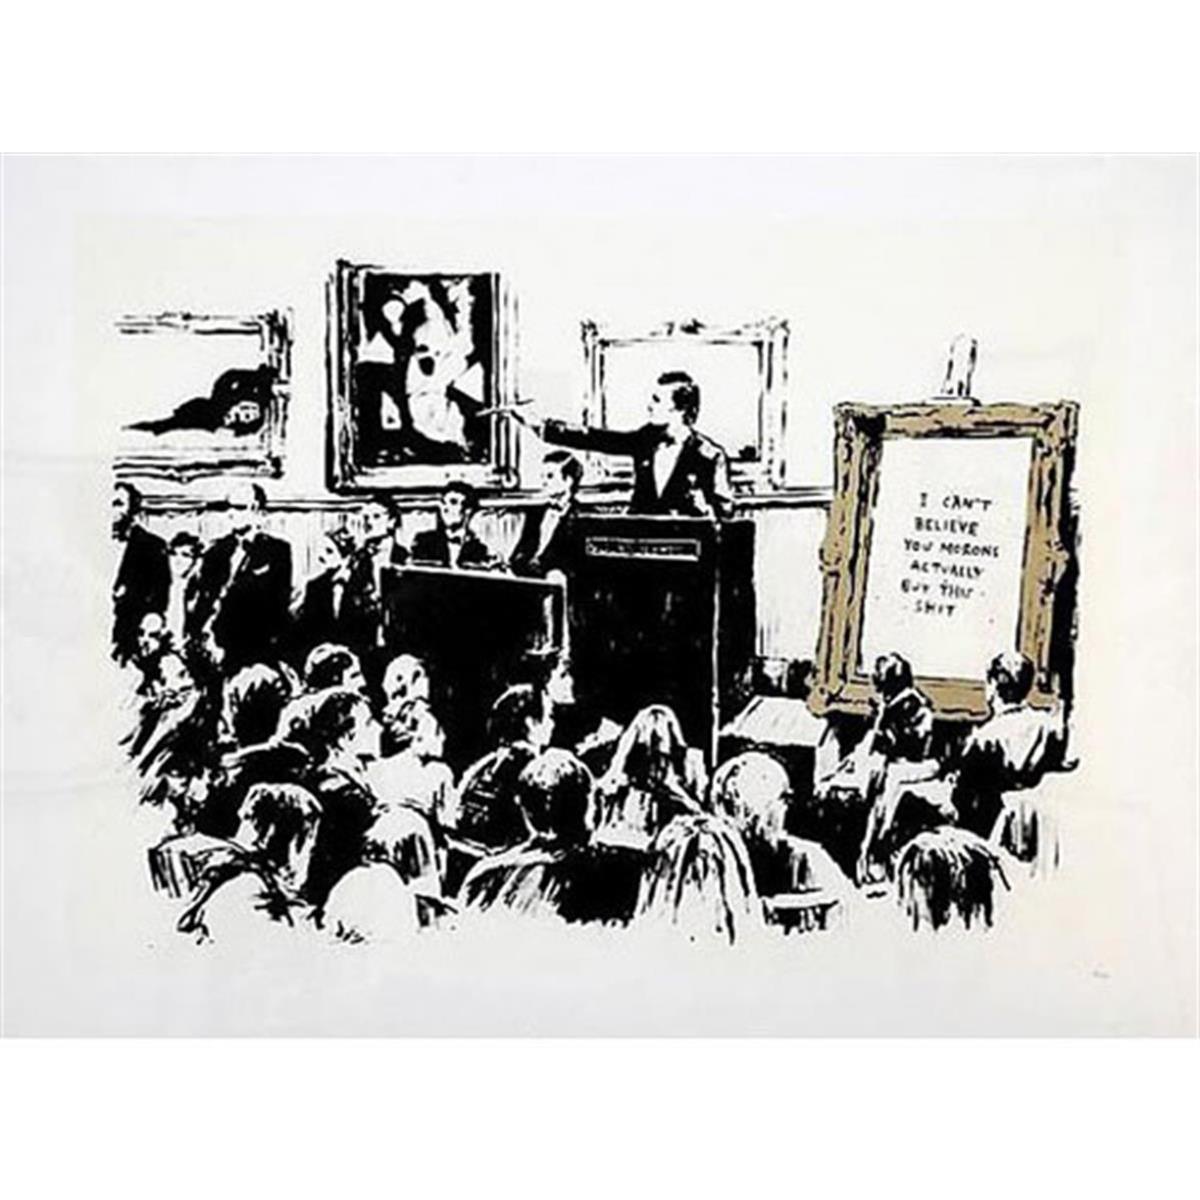 Morons (LA Edition Sepia) by Banksy